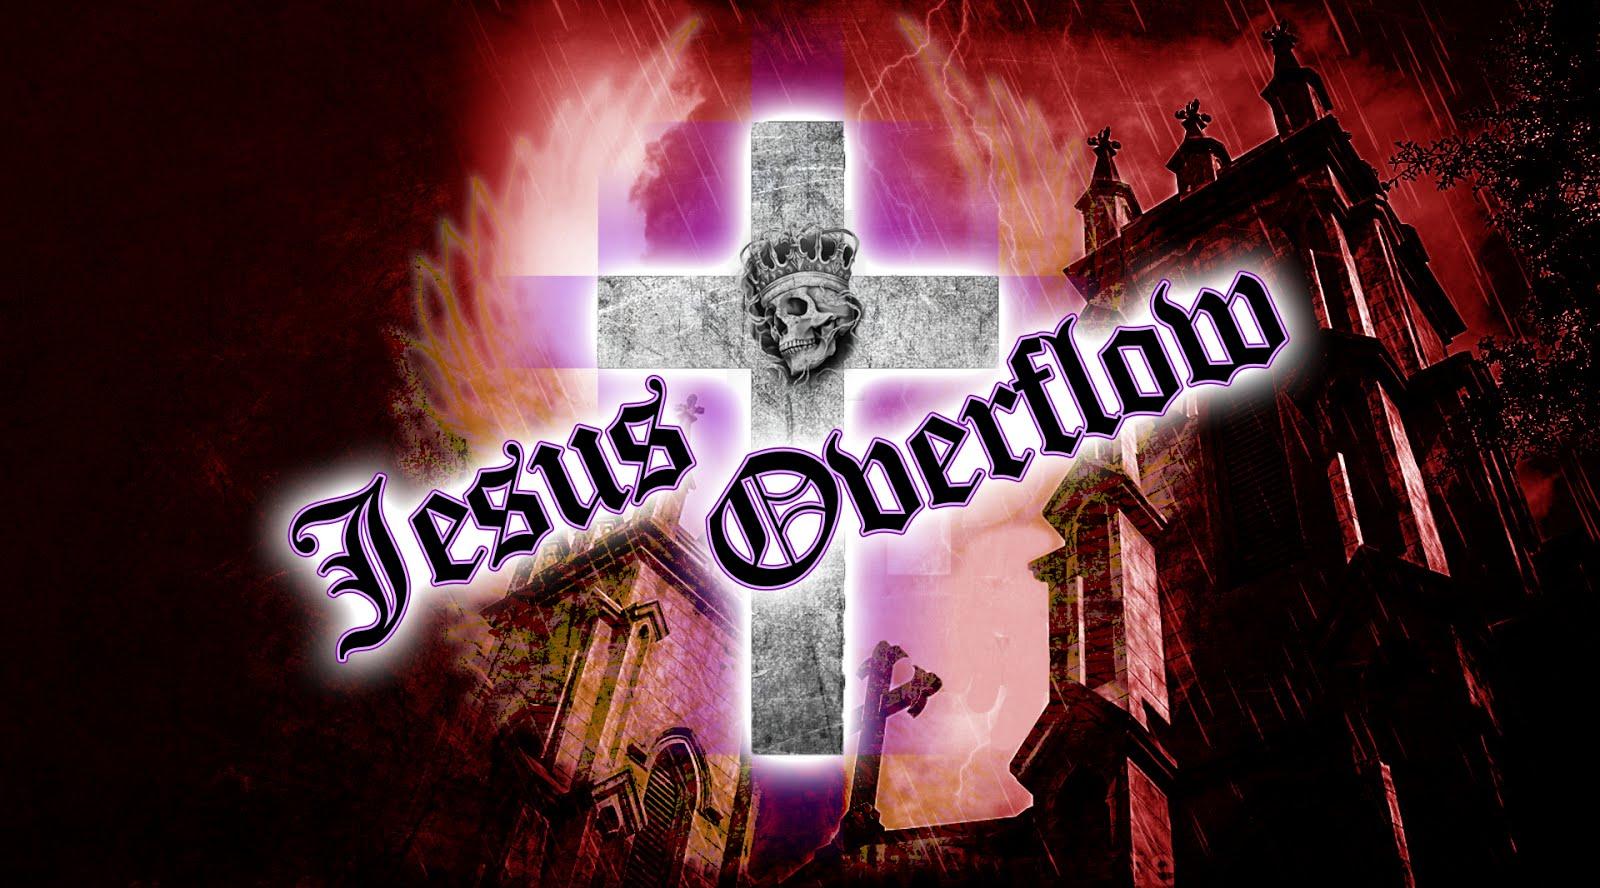 JESUS OVERFLOW